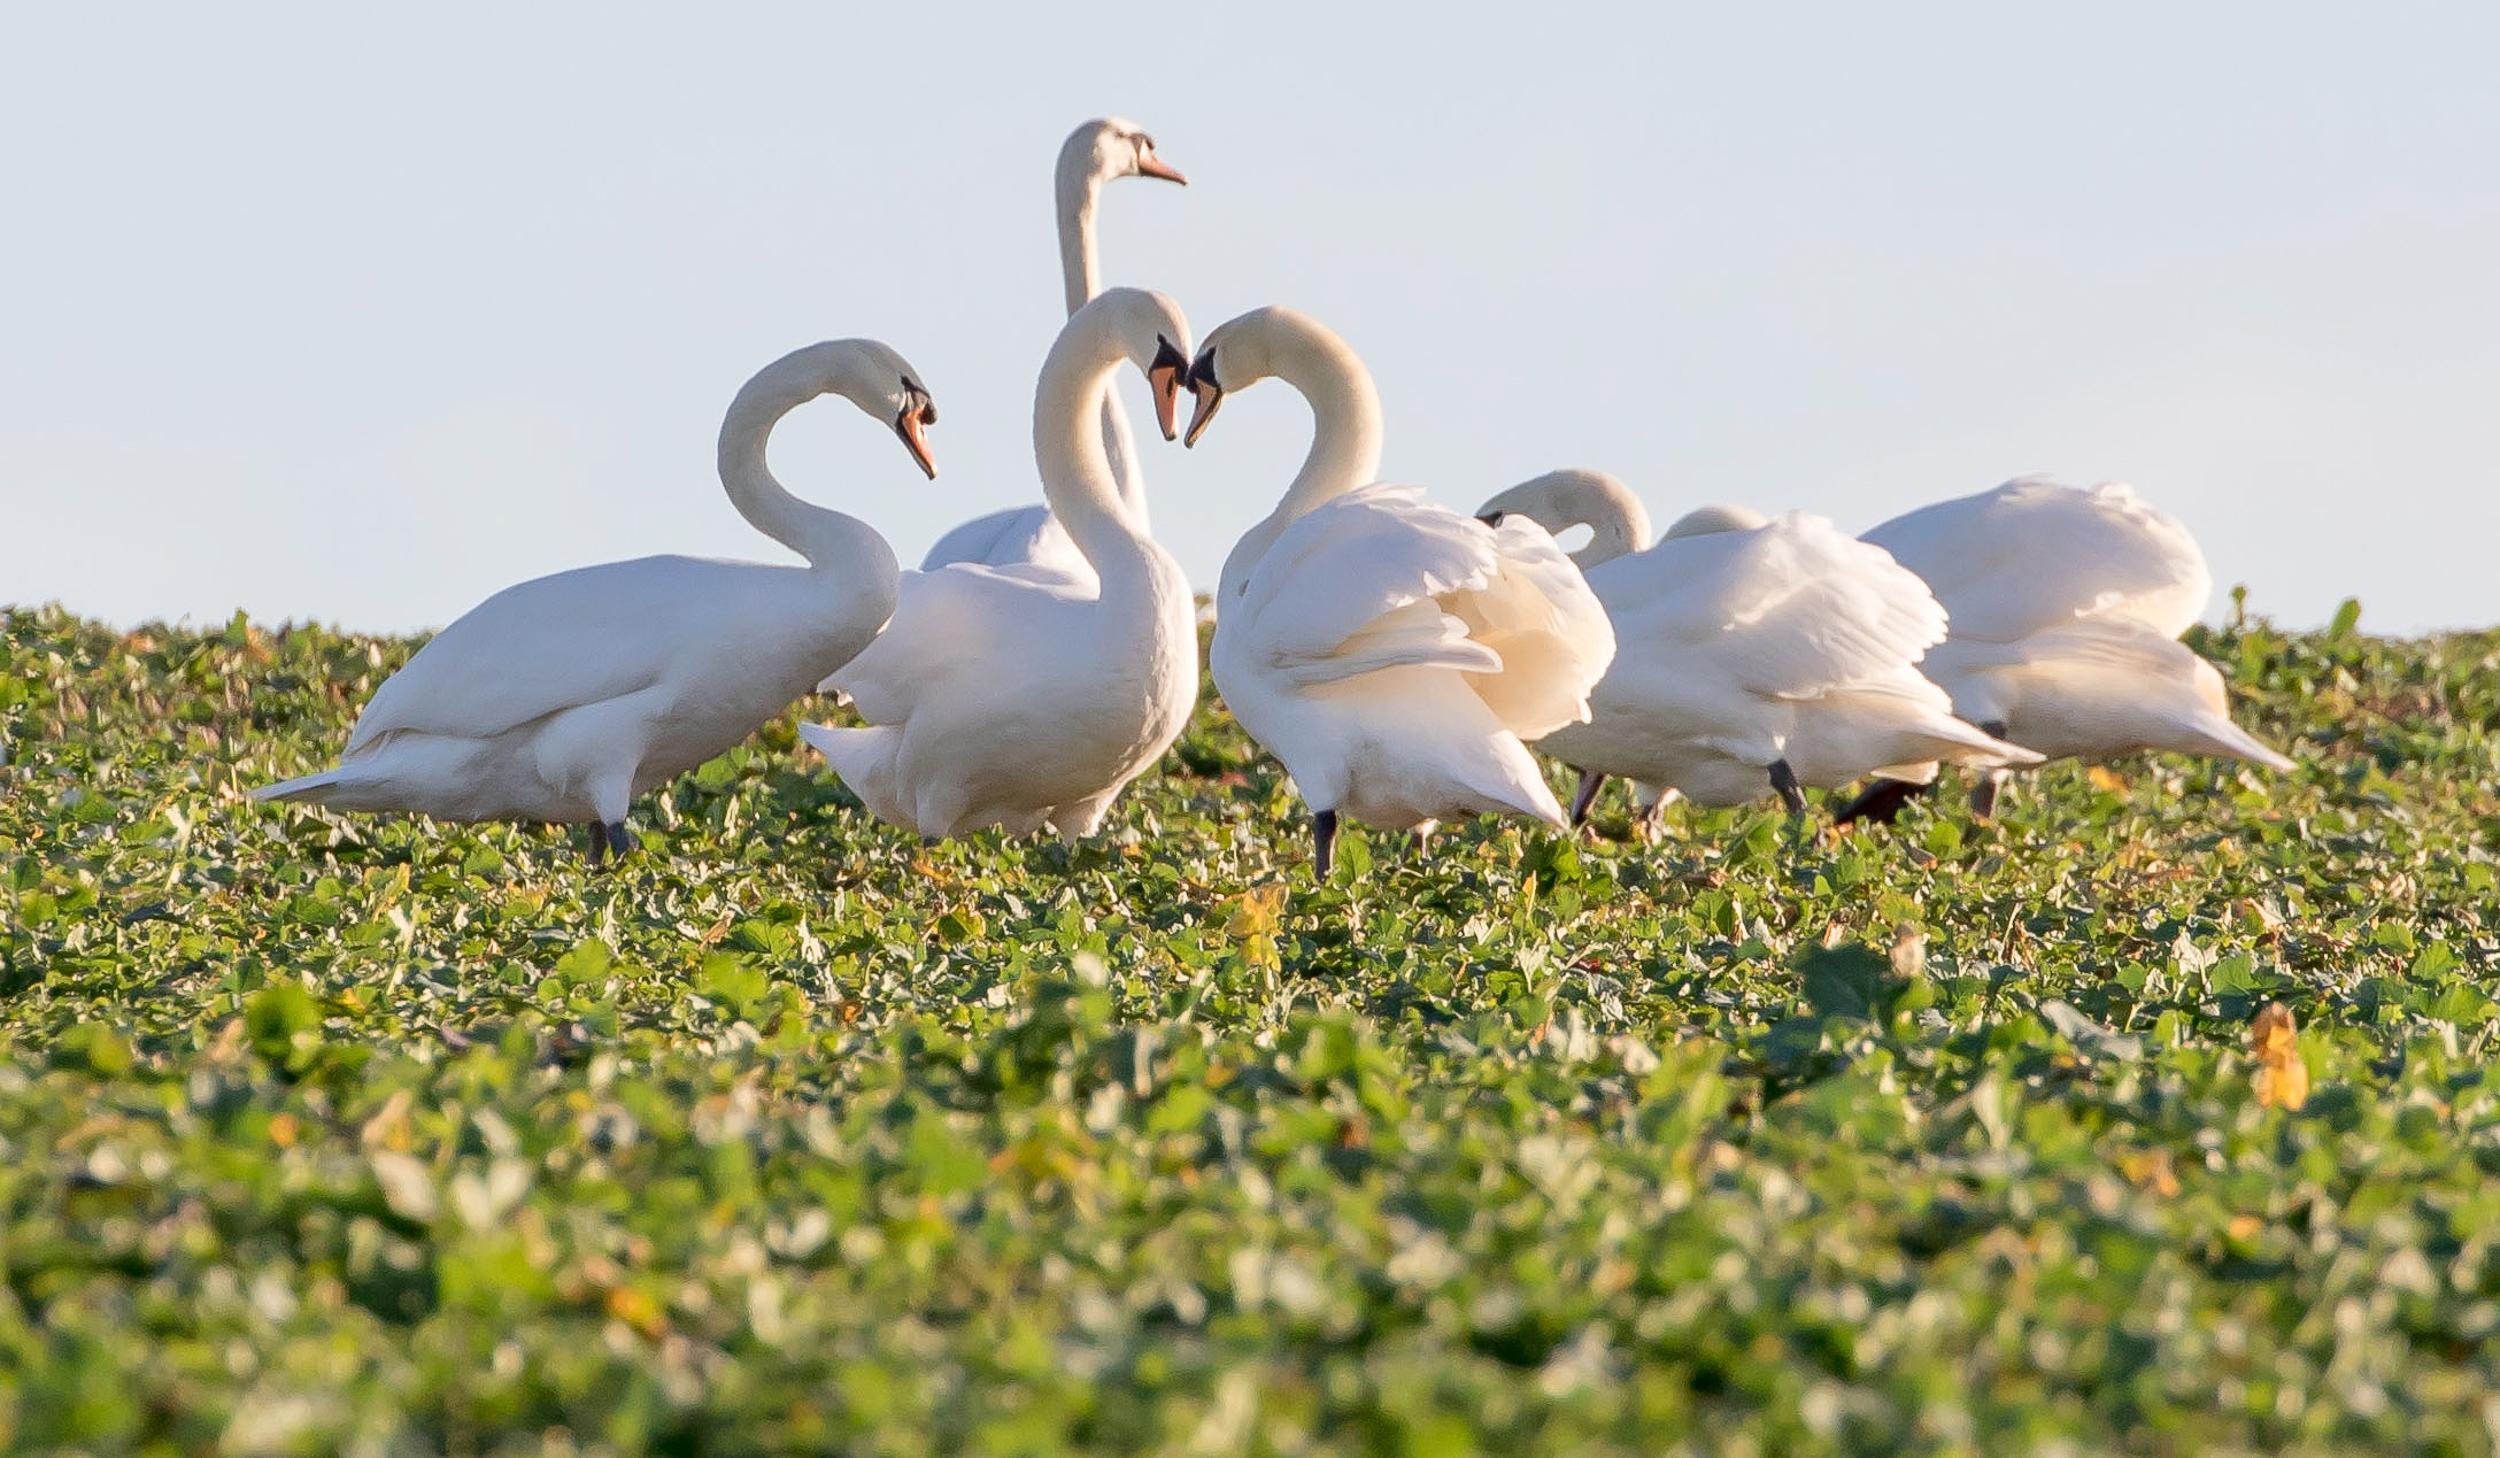 Wallpaper : white, birds, animals, nature, love, heart